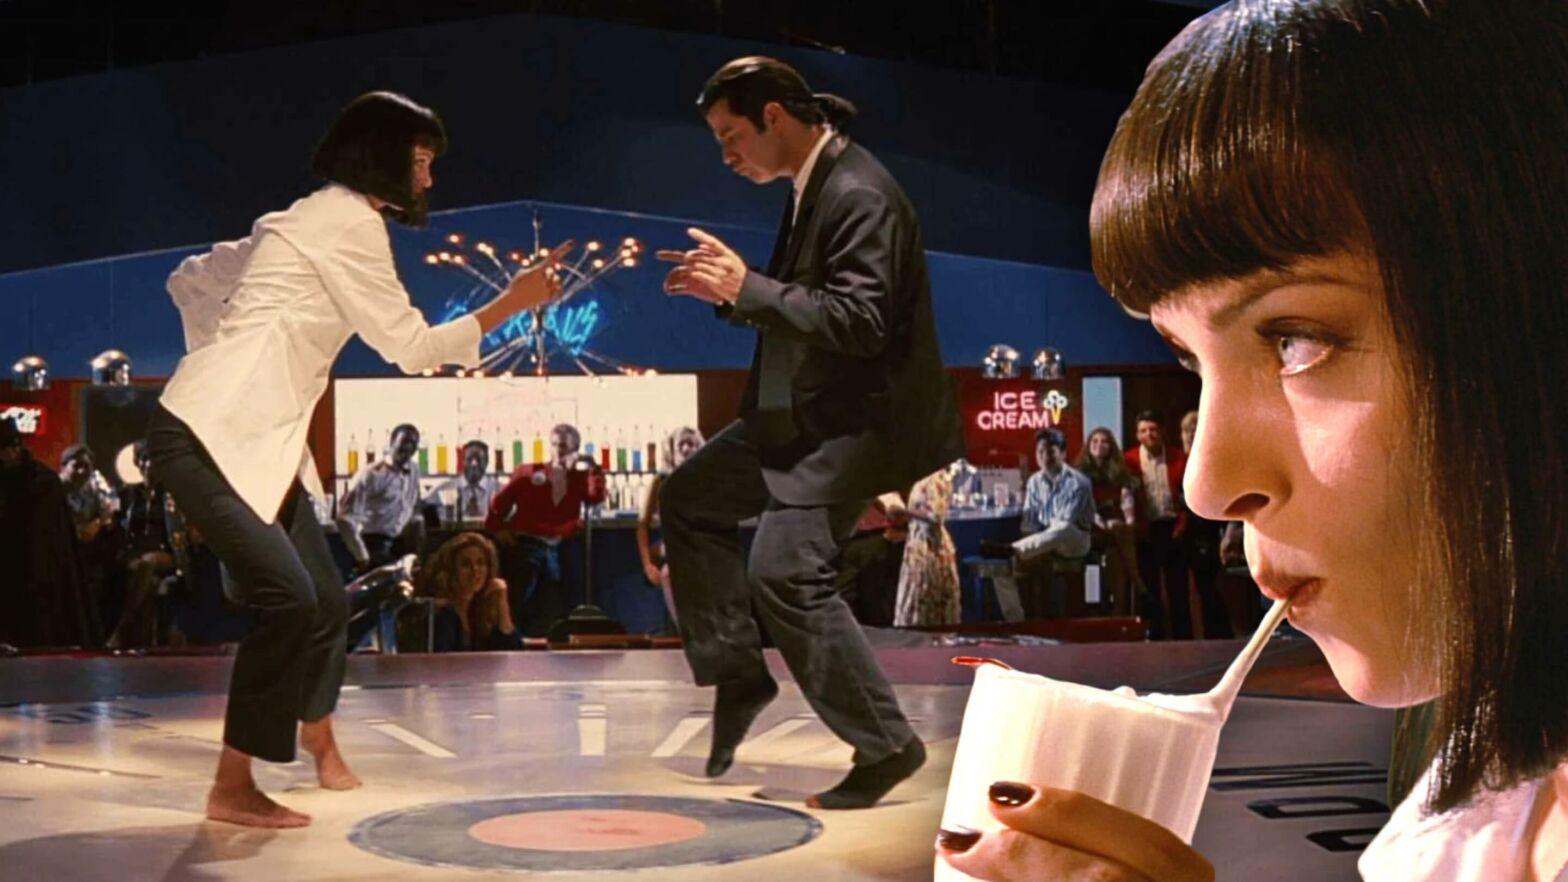 Pulp Fiction Dance Scene What Makes this Quentin Tarantino Scene So Great